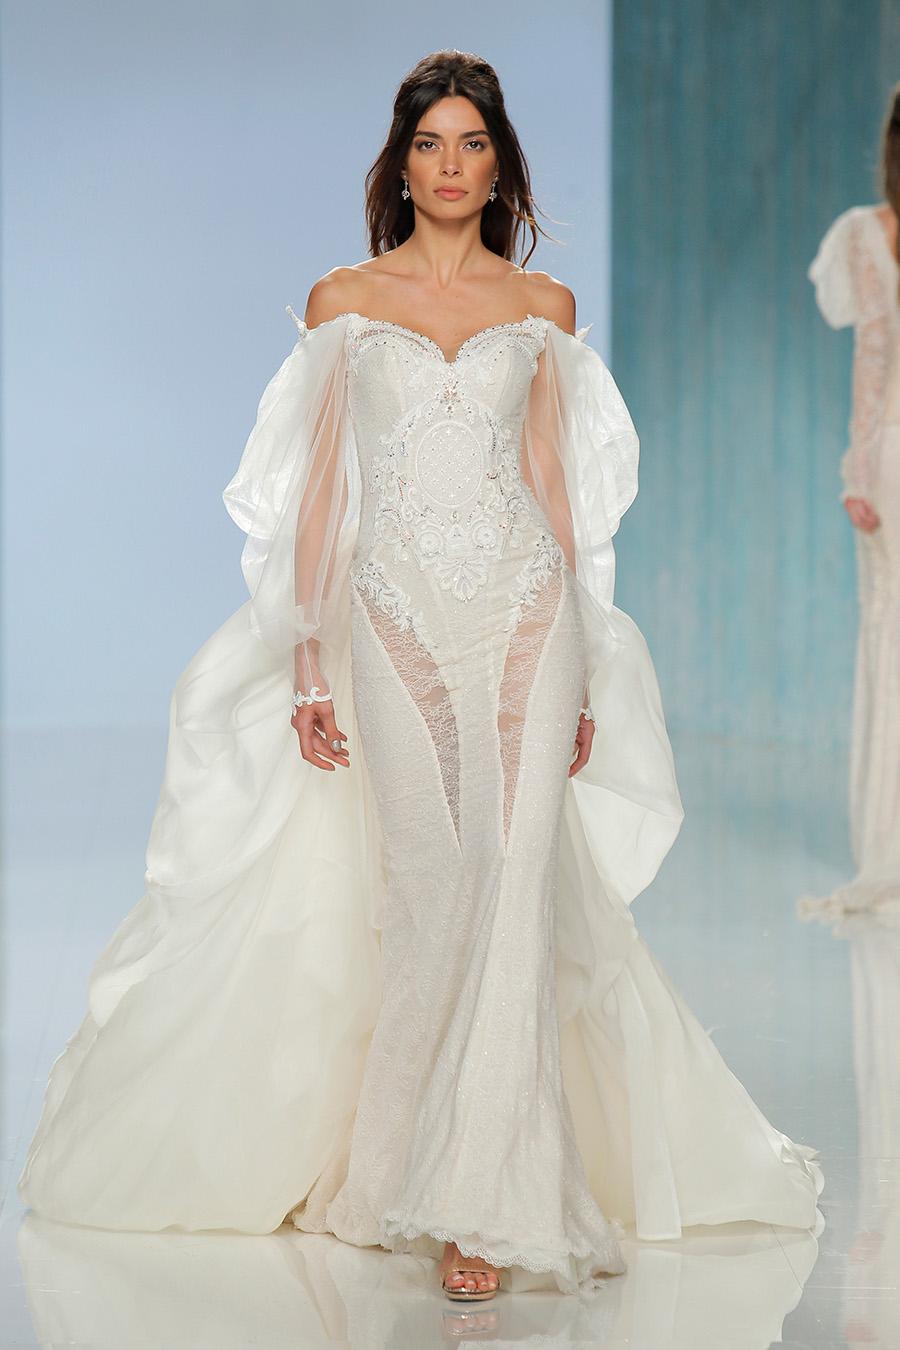 e65e21fc93 A word from Galia Lahav… GALA No. IV GALA is our premium made-to-order  bridal line